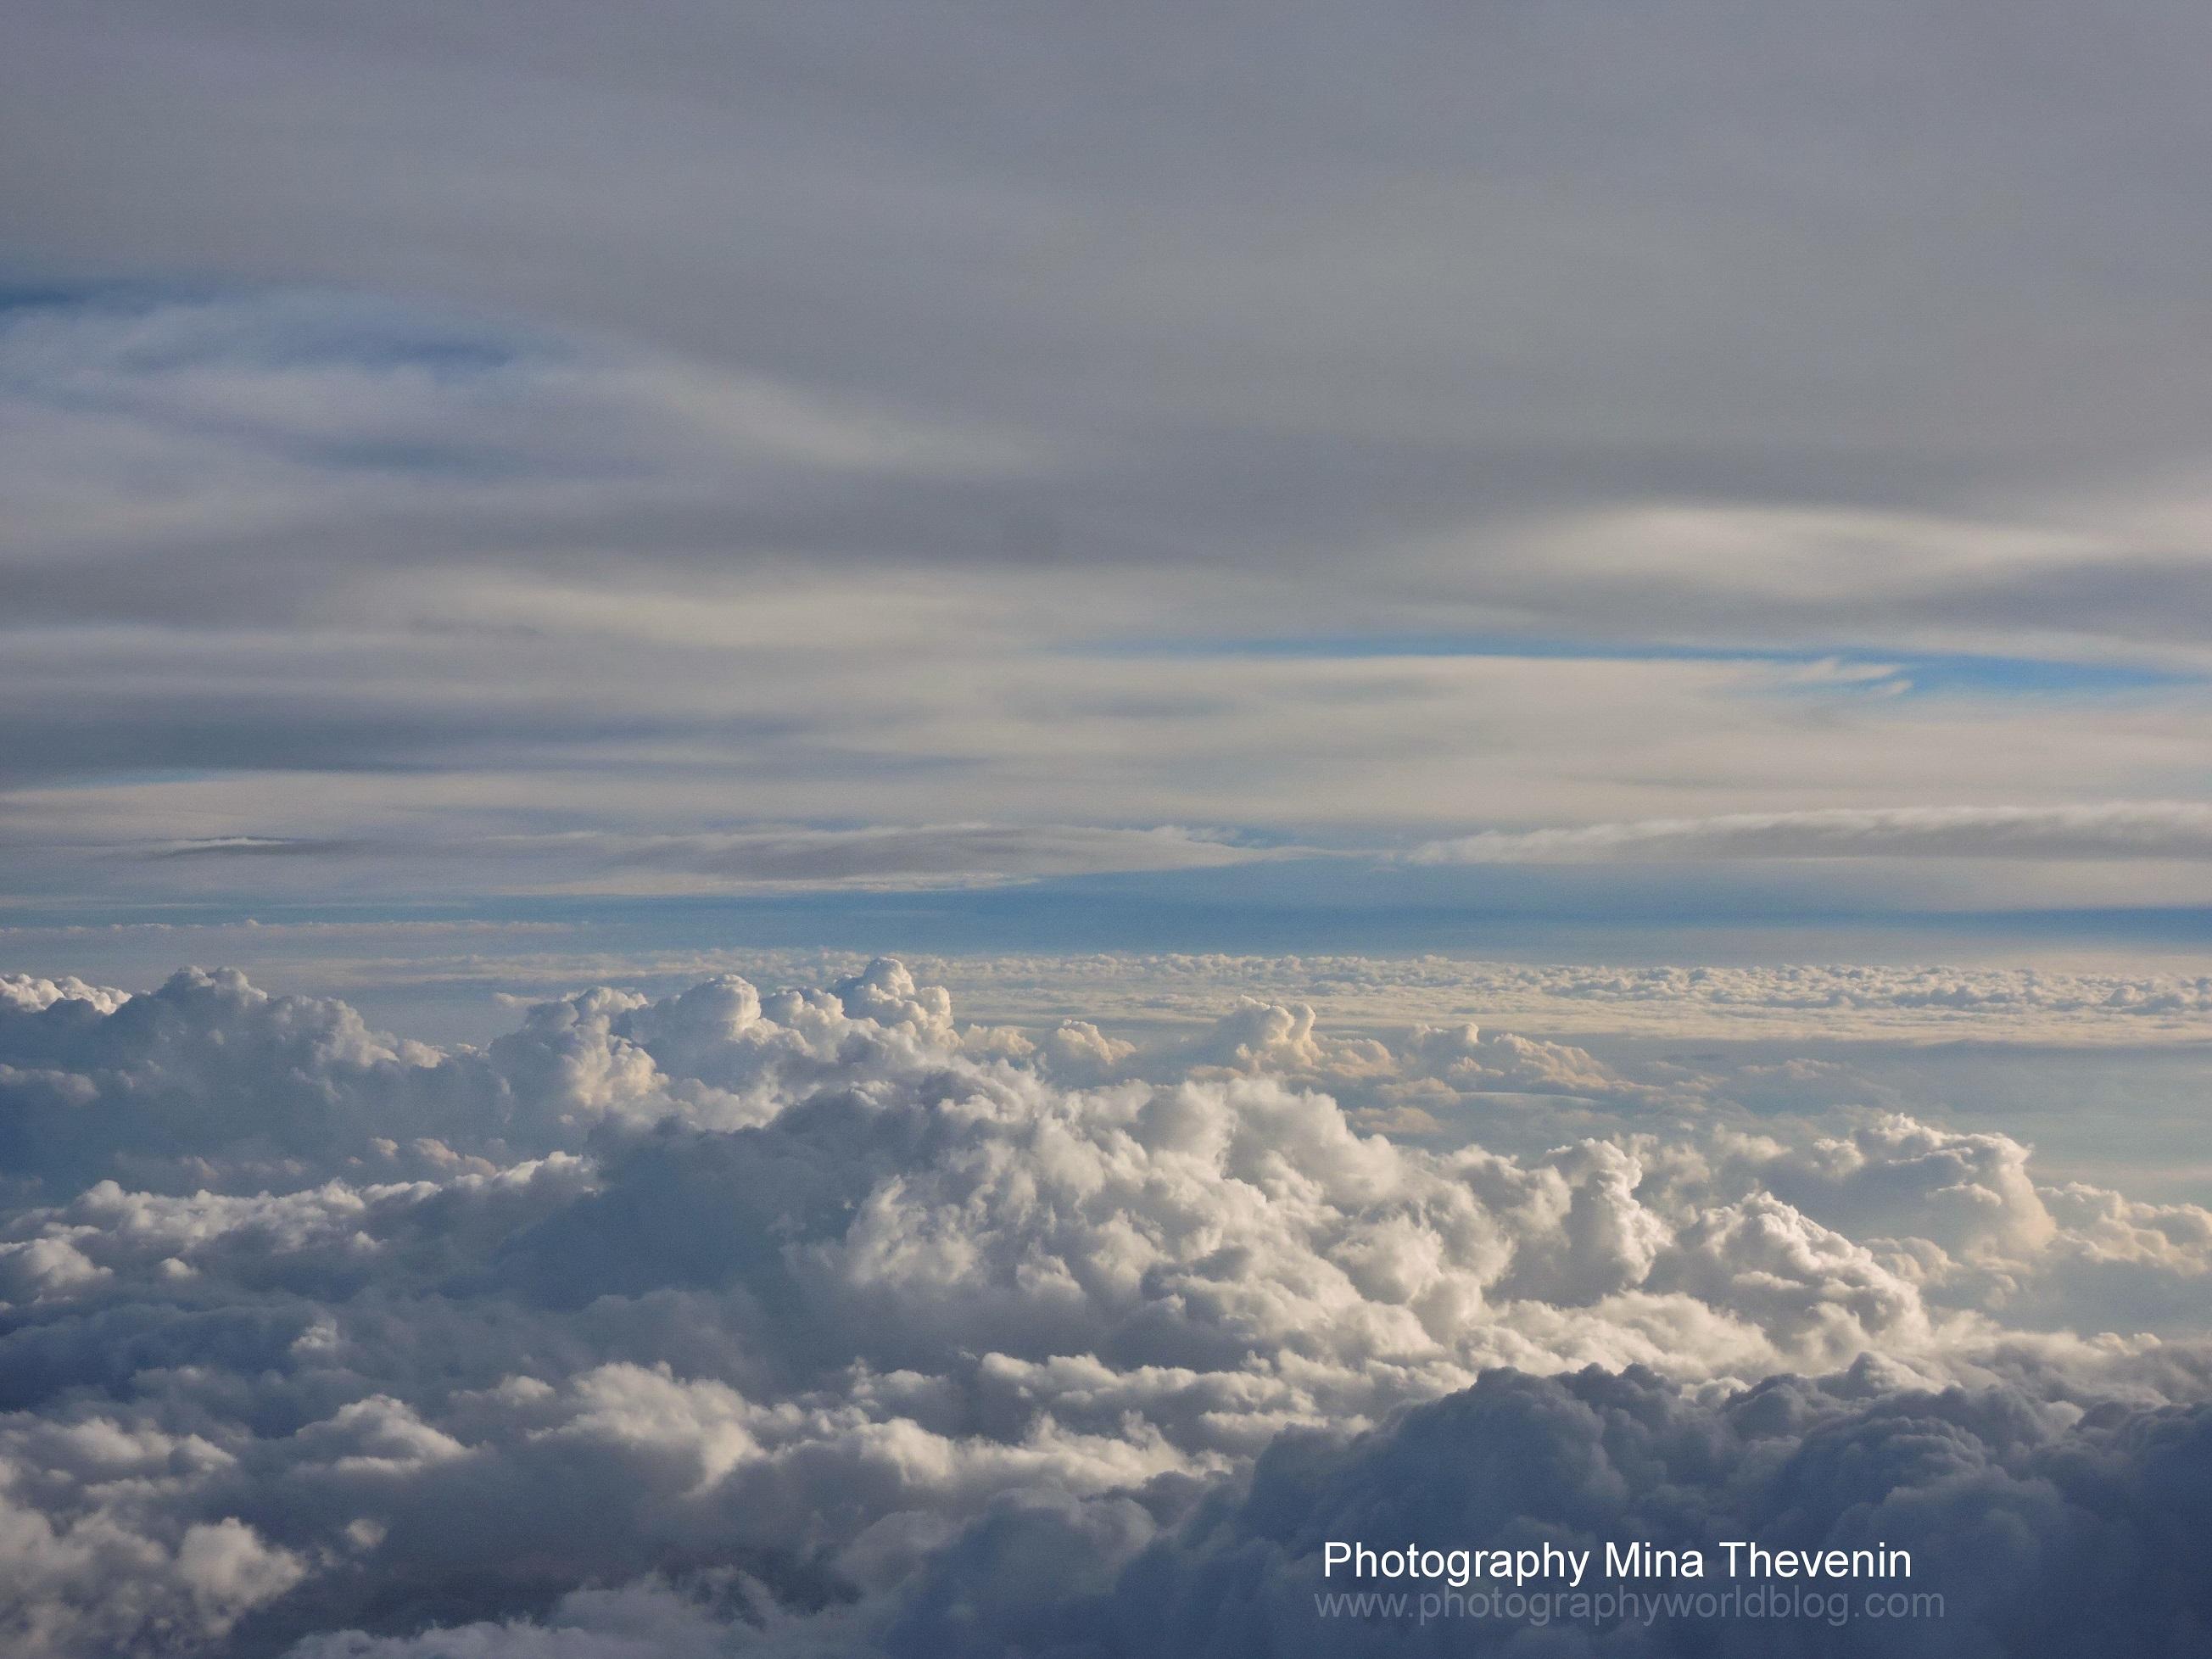 © Sunset Striation. Photograph by Mina Thevenin. Photography World Online Publication. www.photographyworld.org